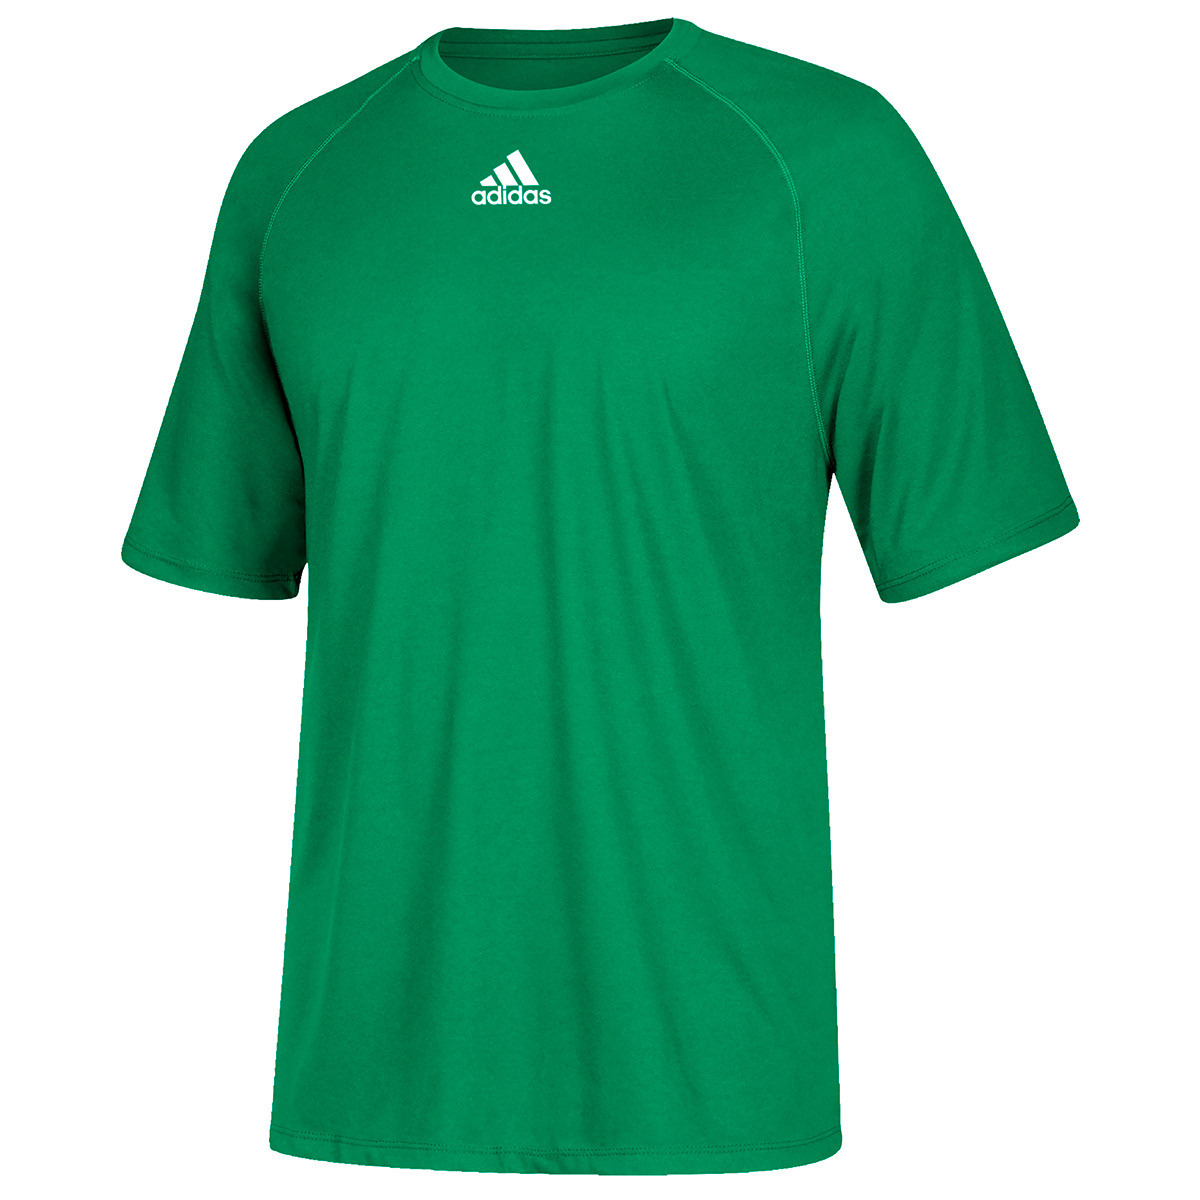 Adidas Men's Climalite Short-Sleeve Tee - Green, XXL